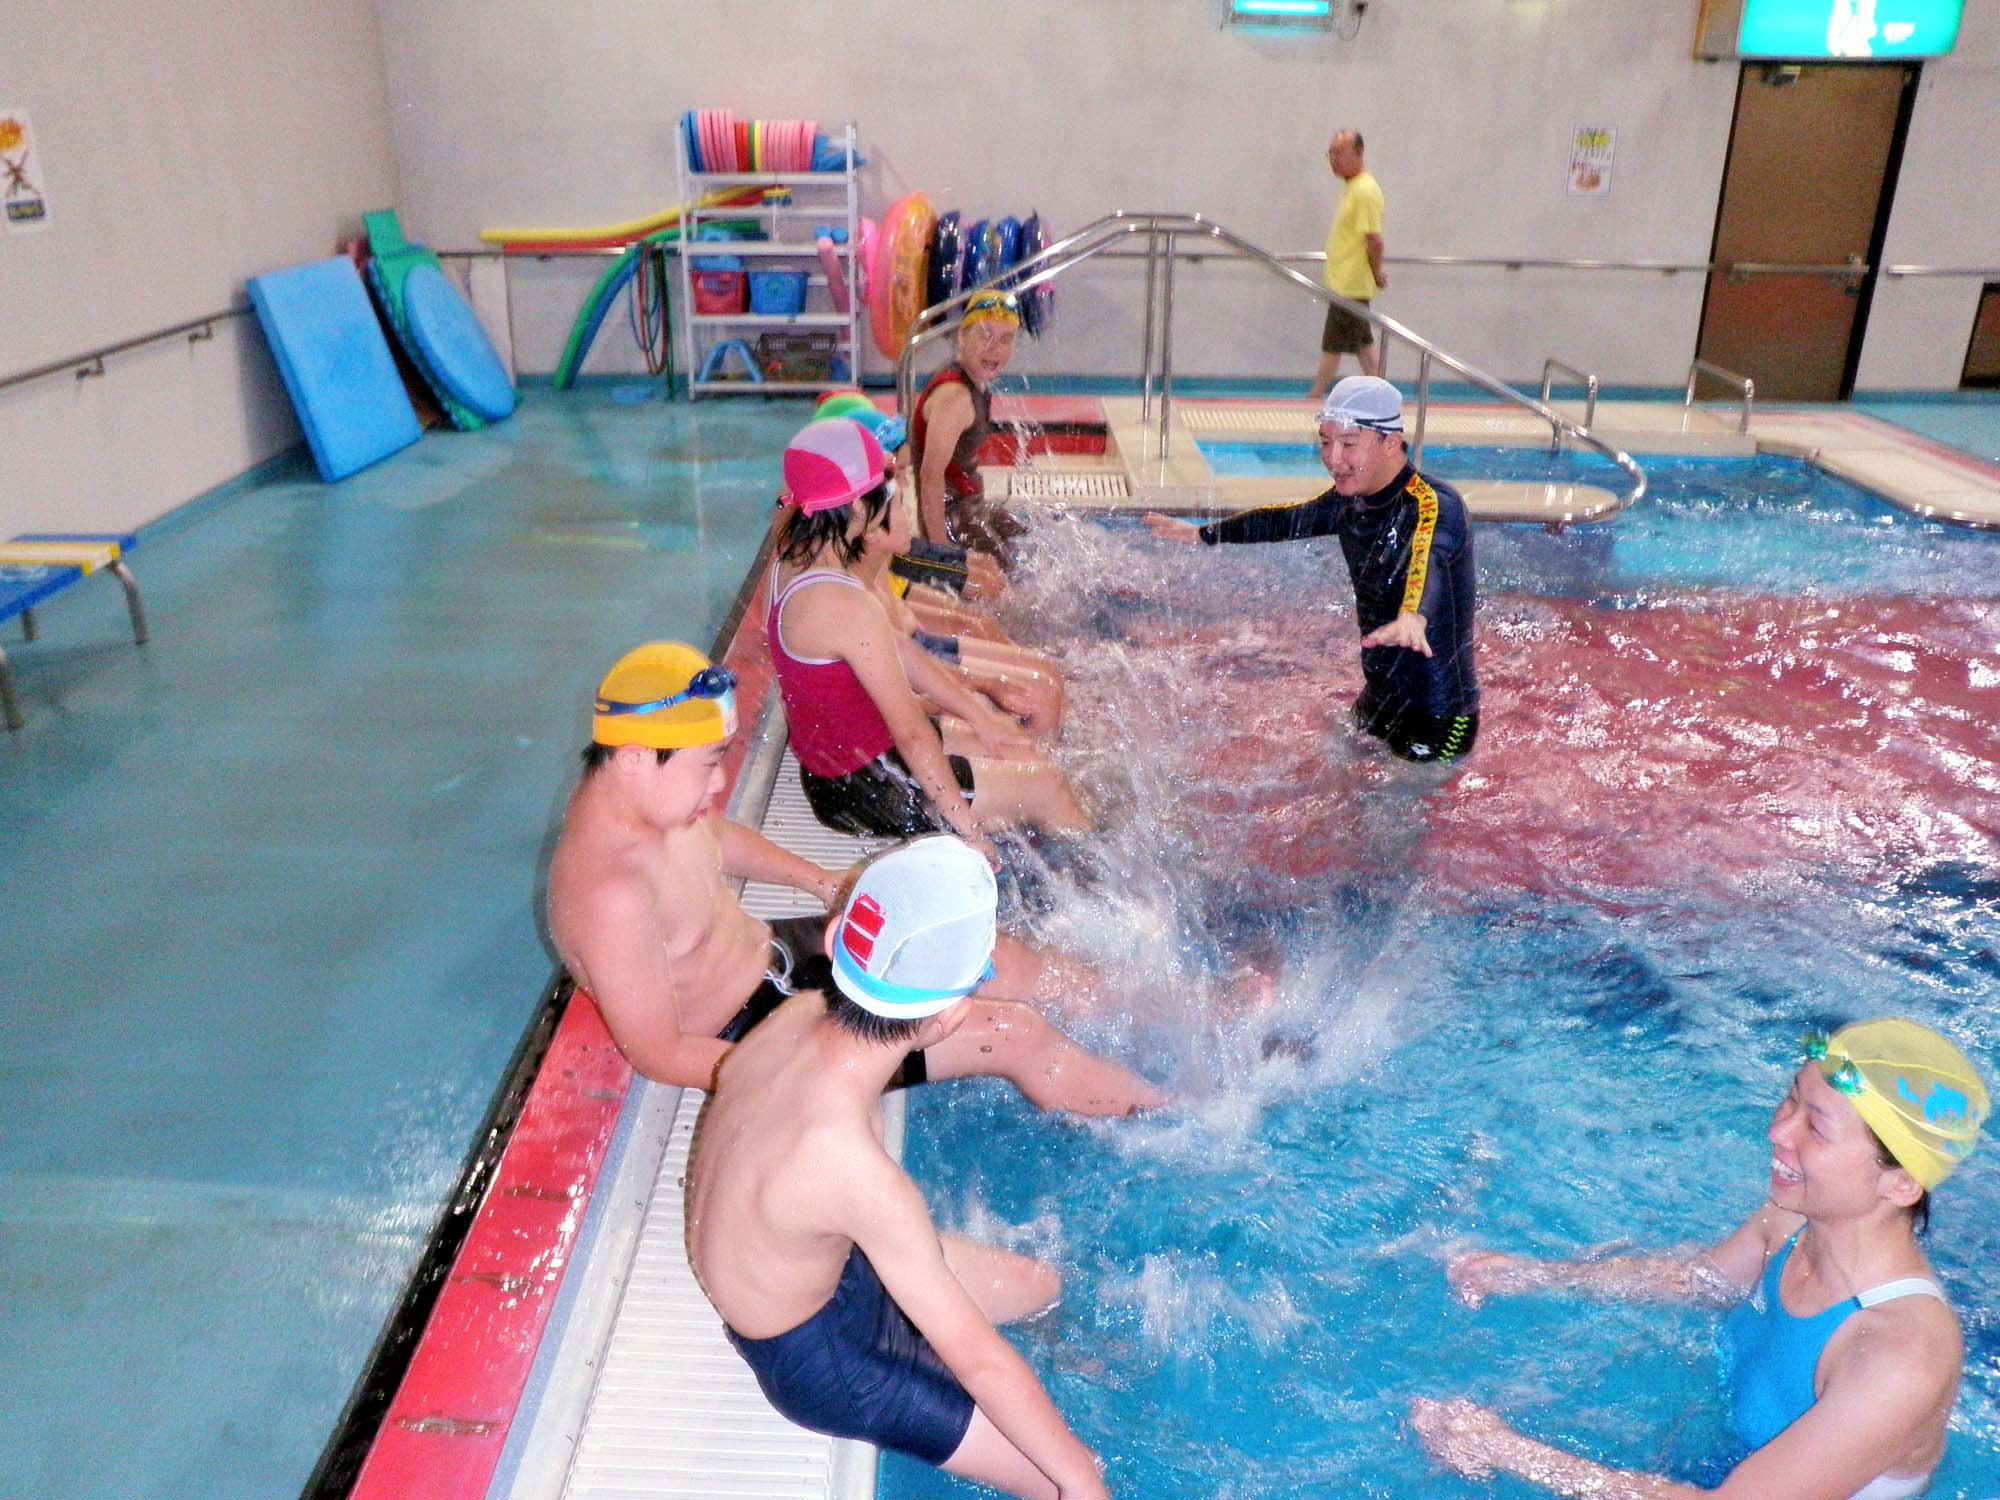 P7110323 - 都障水連による水泳教室より ・・・共催でおこなっています。